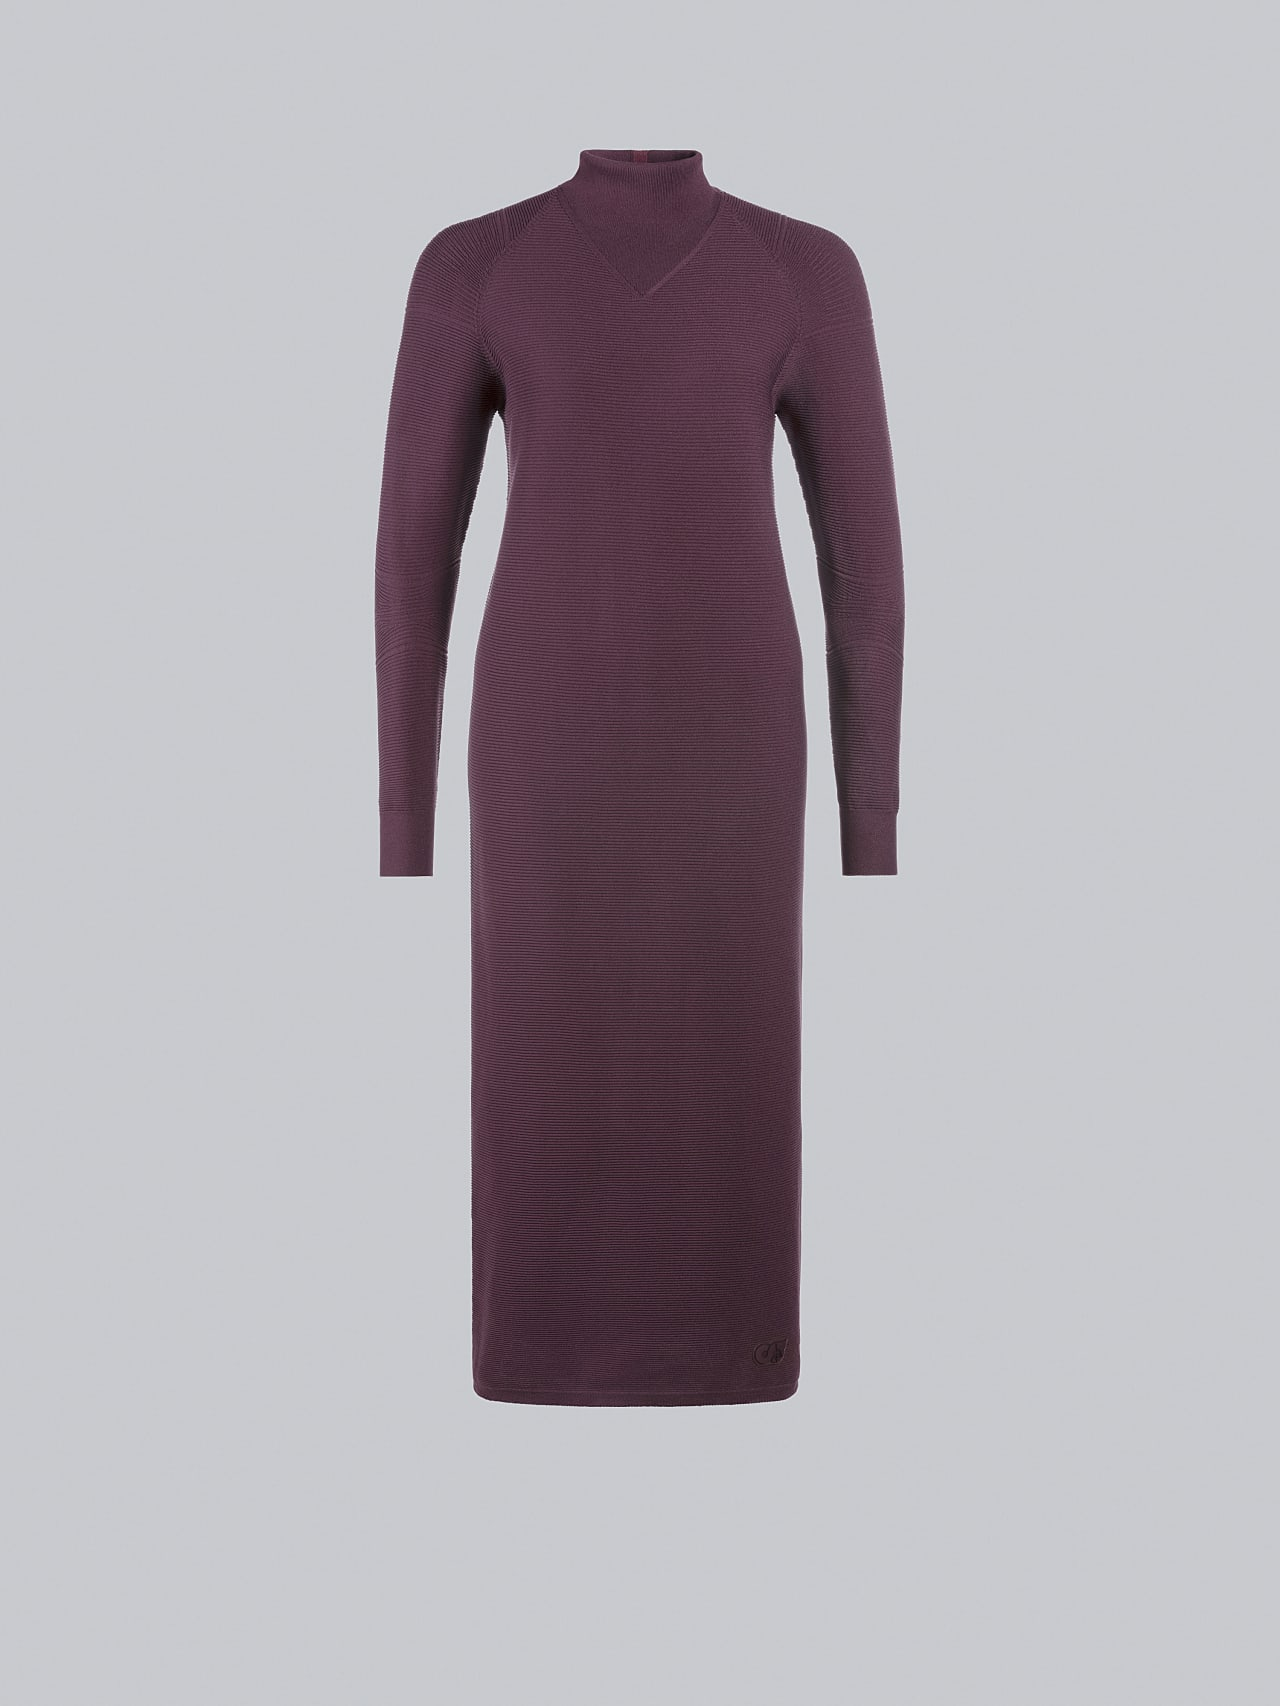 FOXEE V1.Y5.02 Seamless 3D Knit Mock-Neck Dress Burgundy Back Alpha Tauri